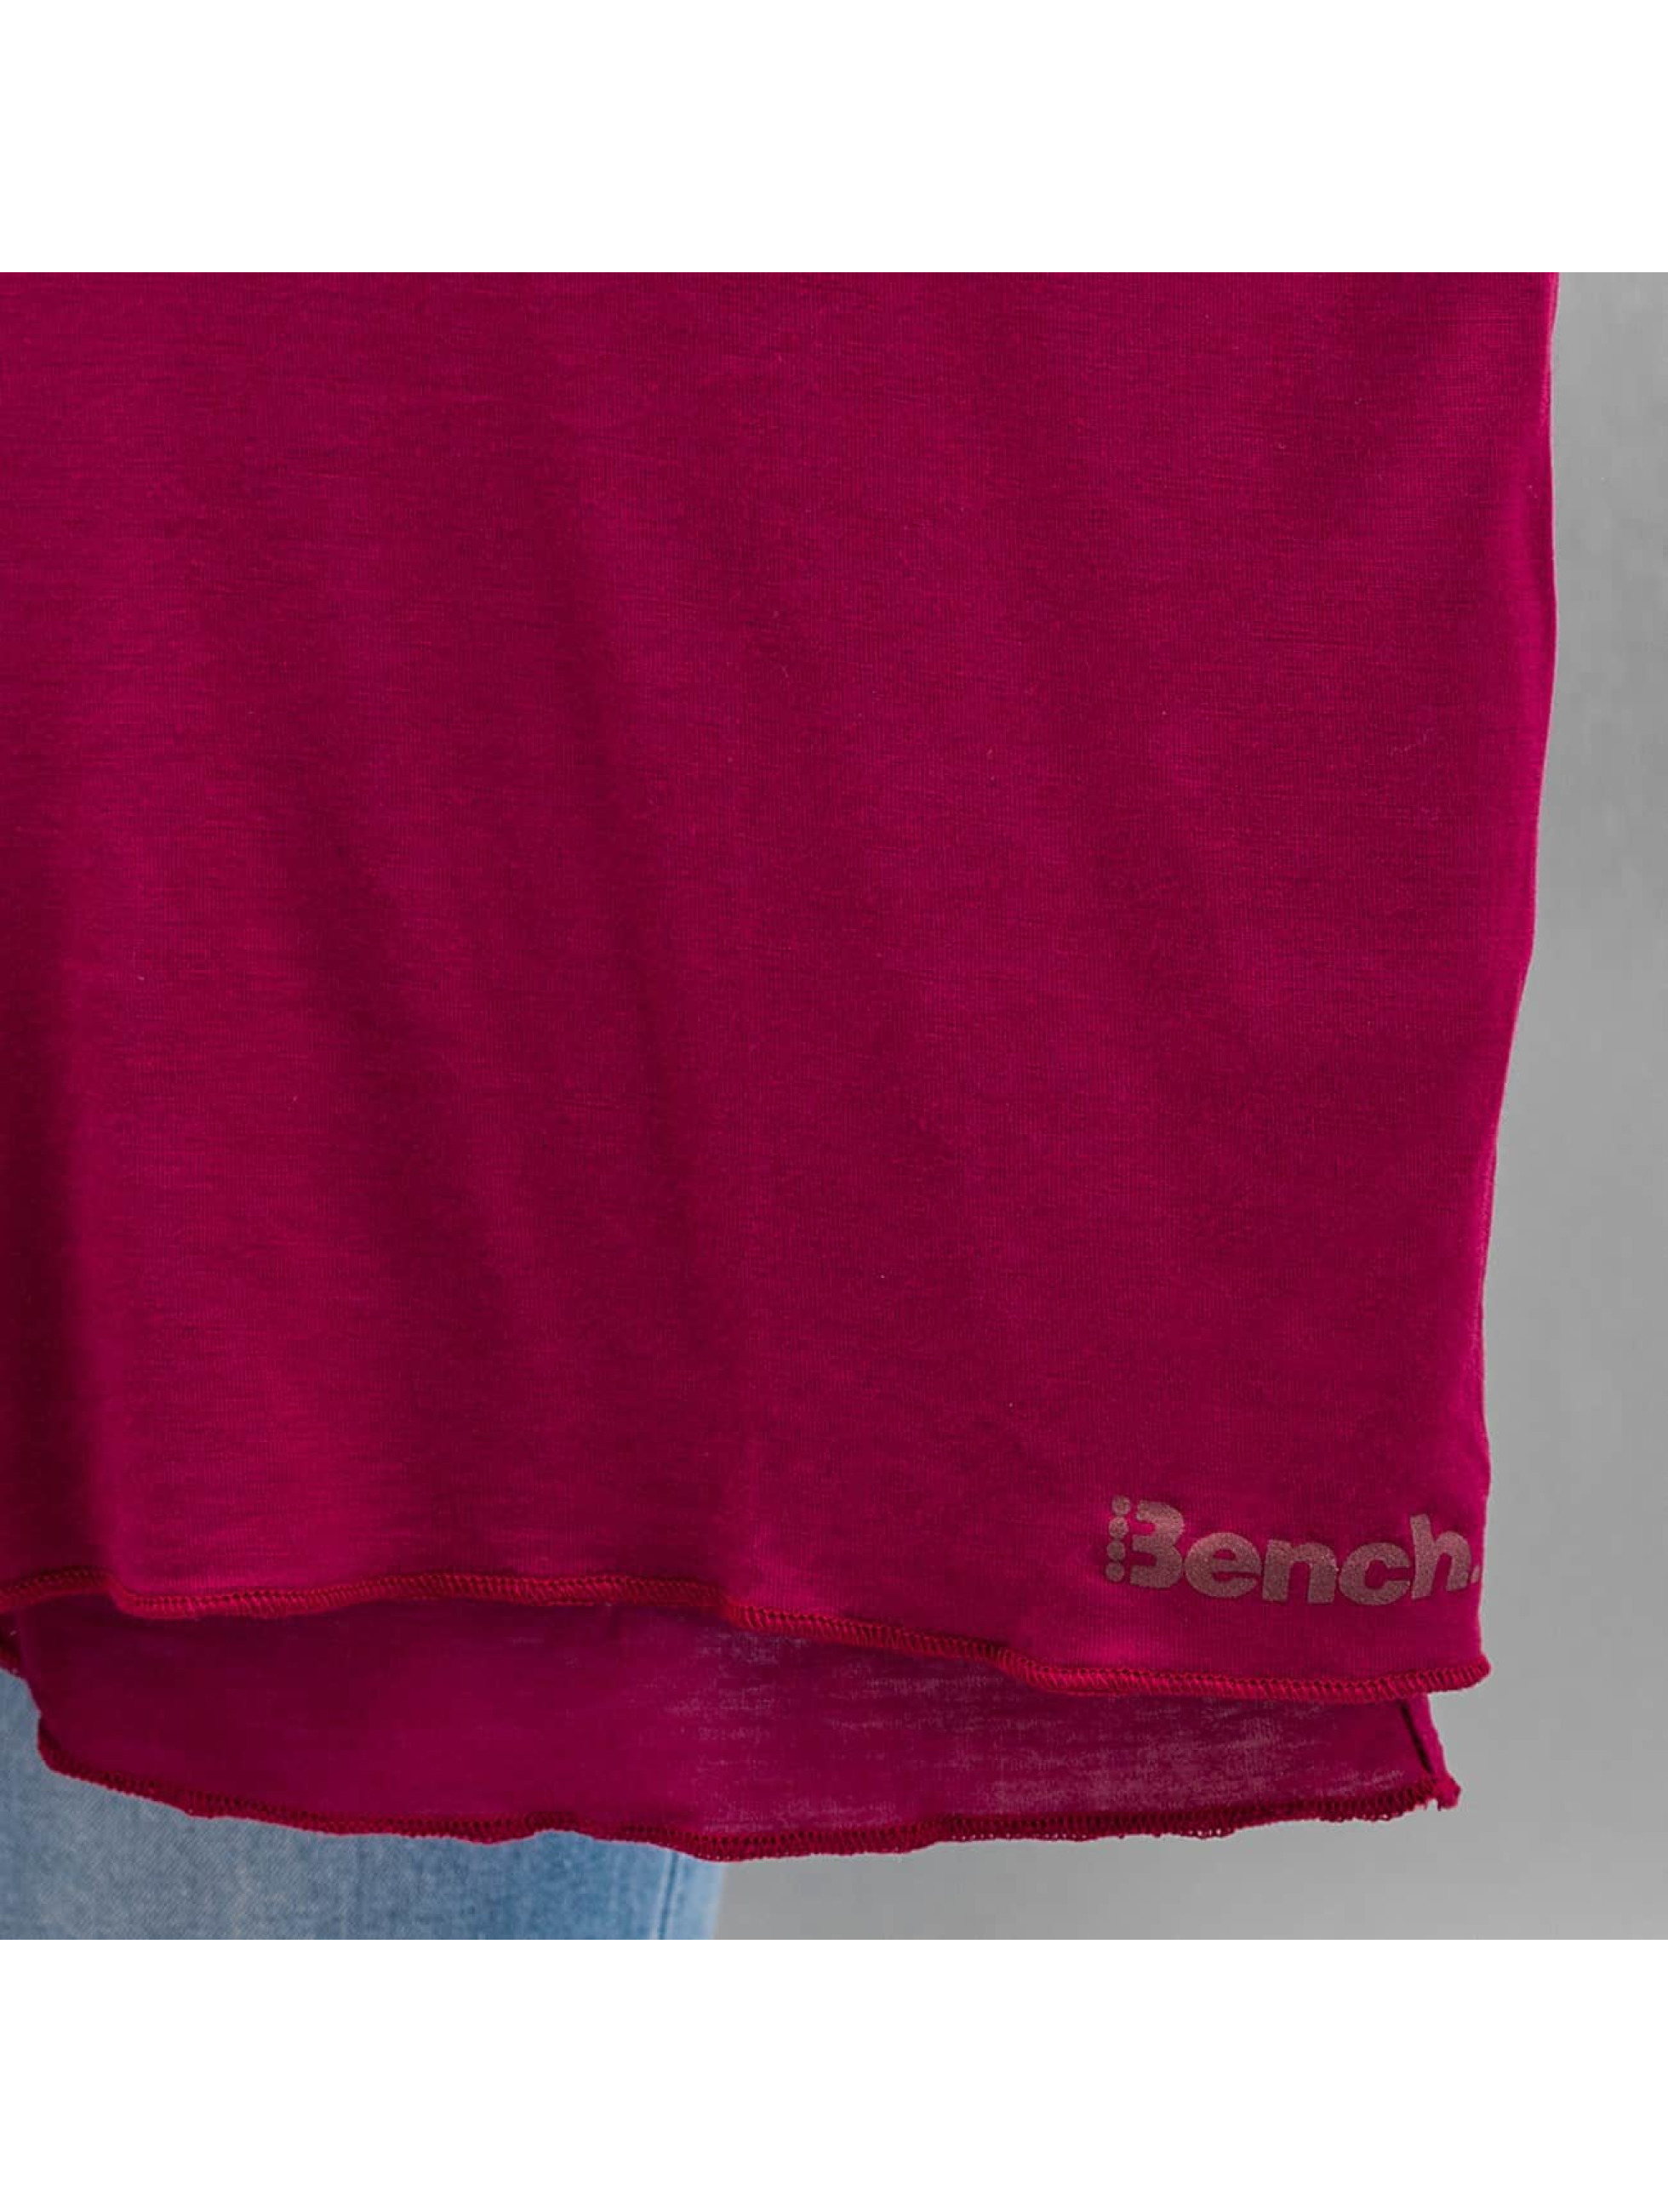 Bench Langermet Performance Addendum Oversize red